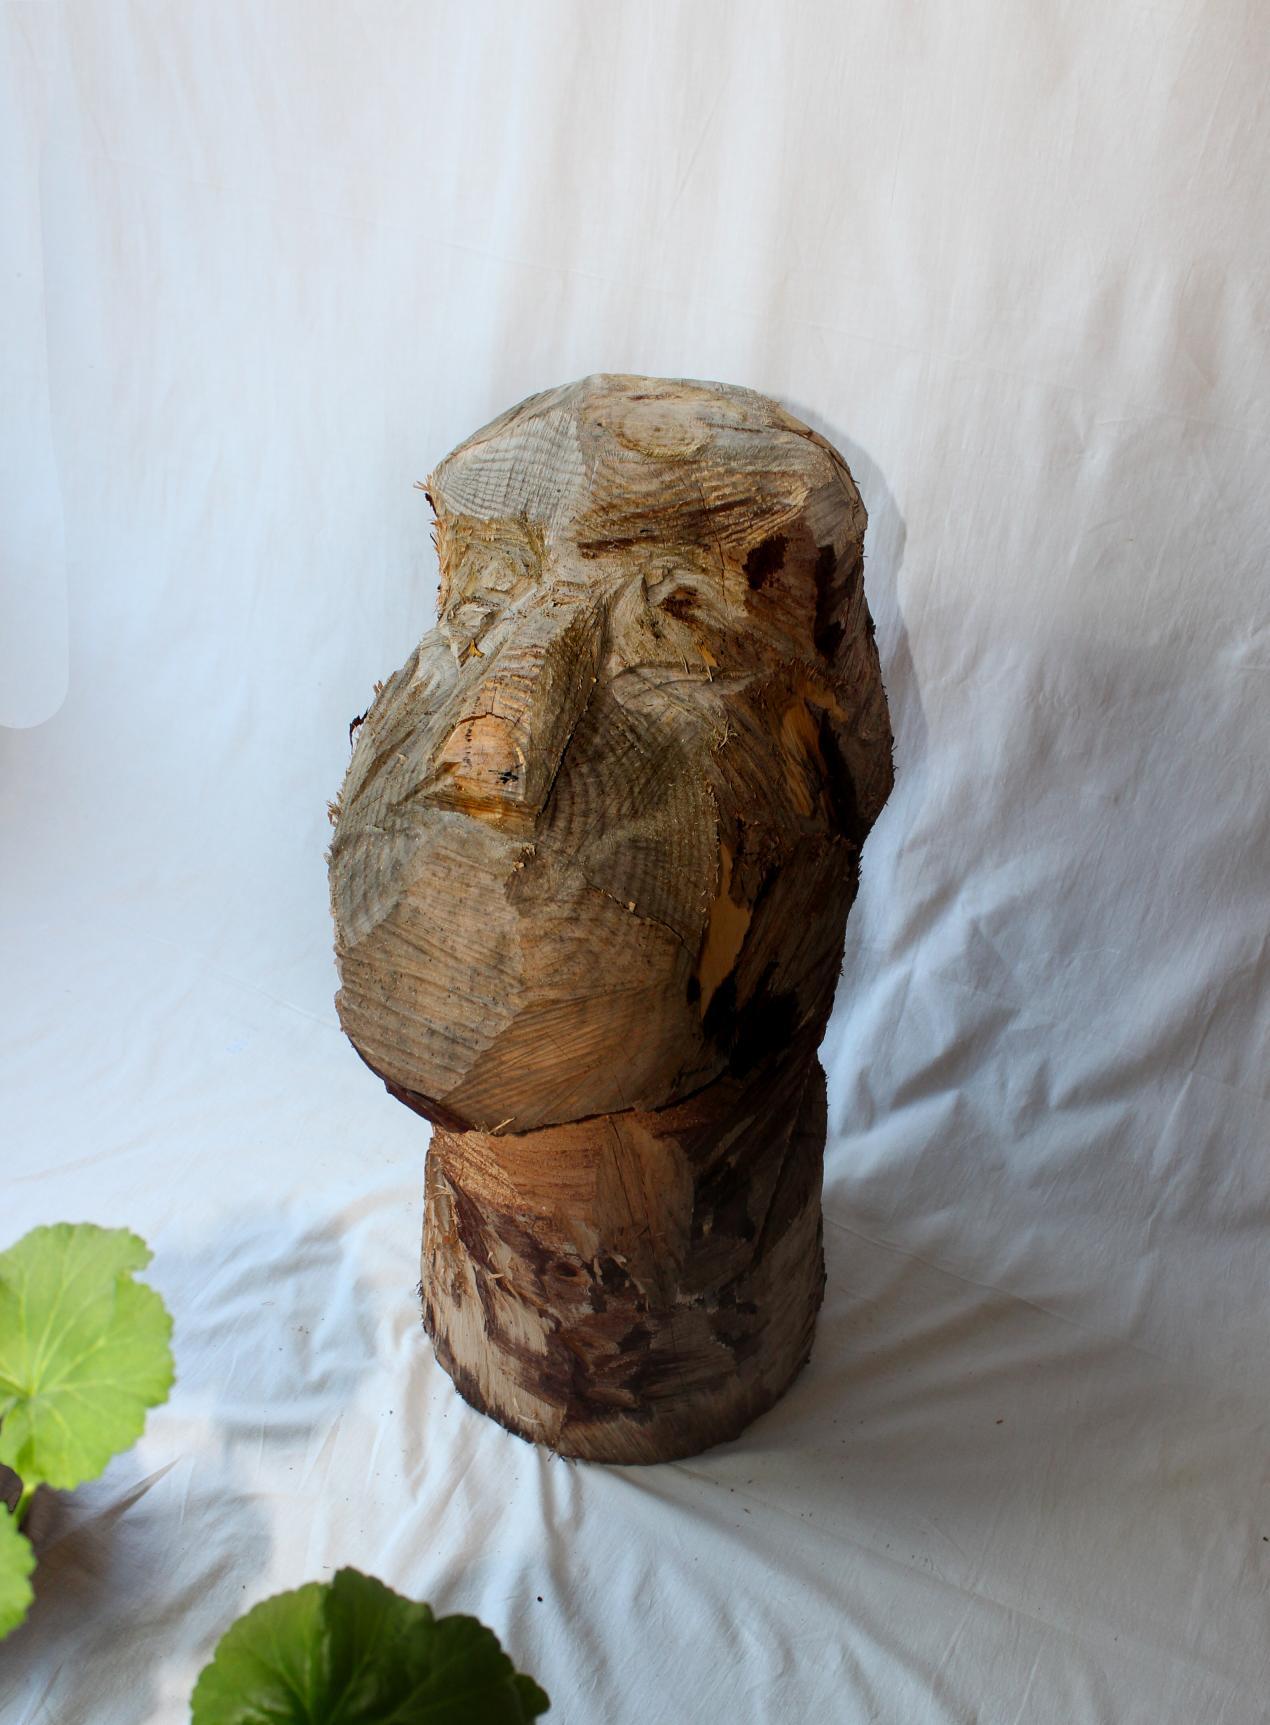 naked-desnudo ( madera y motosierra) (2018) - Valladolid Blanco Choya - BLANCO CHOYA